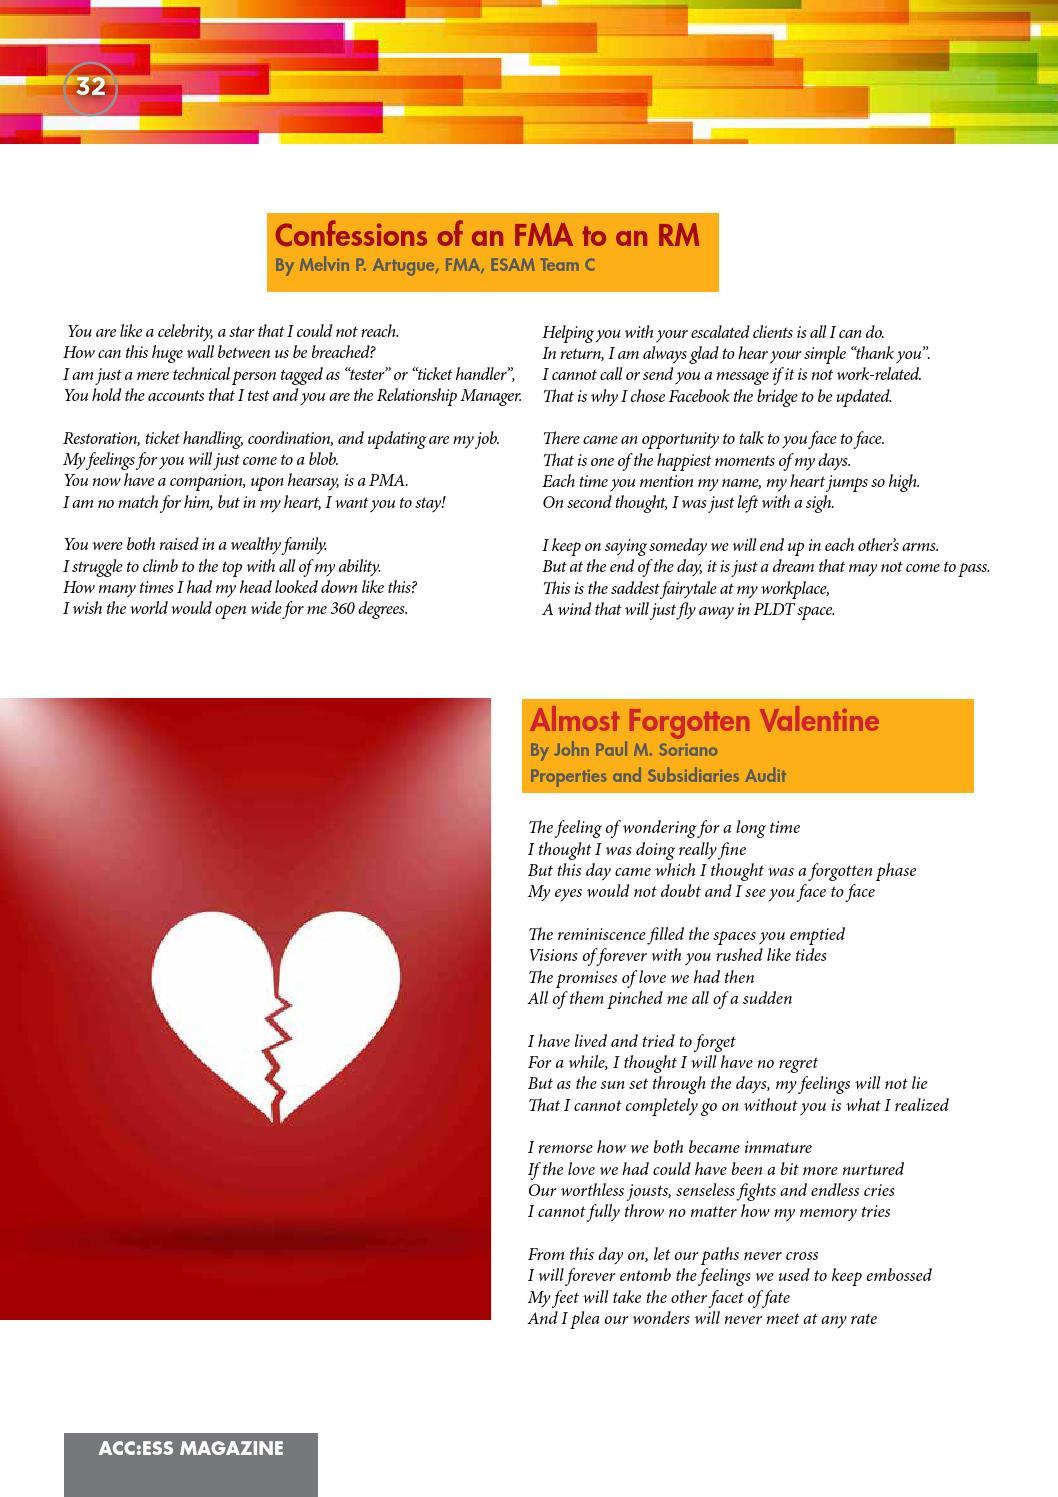 ACC:ESS February 2015 by PLDT Media - issuu